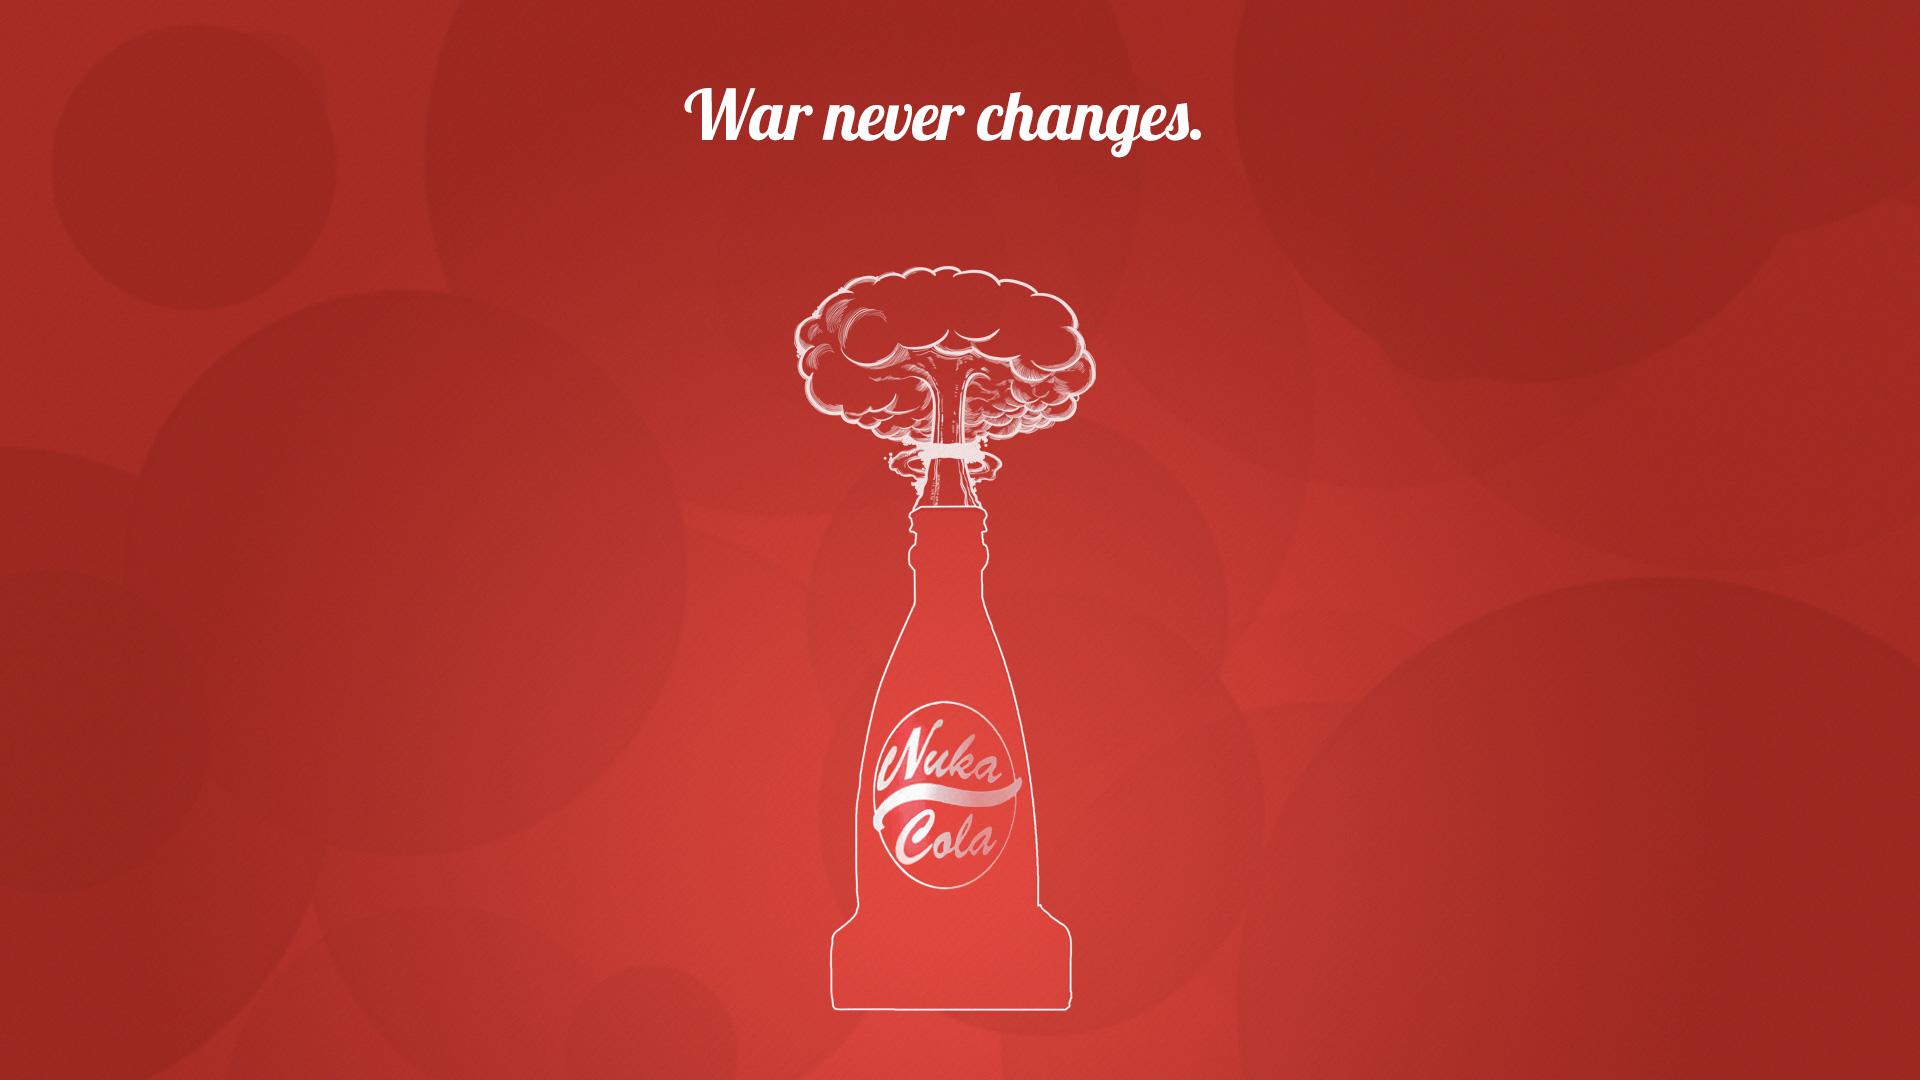 fallout 4 nuka cola desktop wallpaper 1920x1080